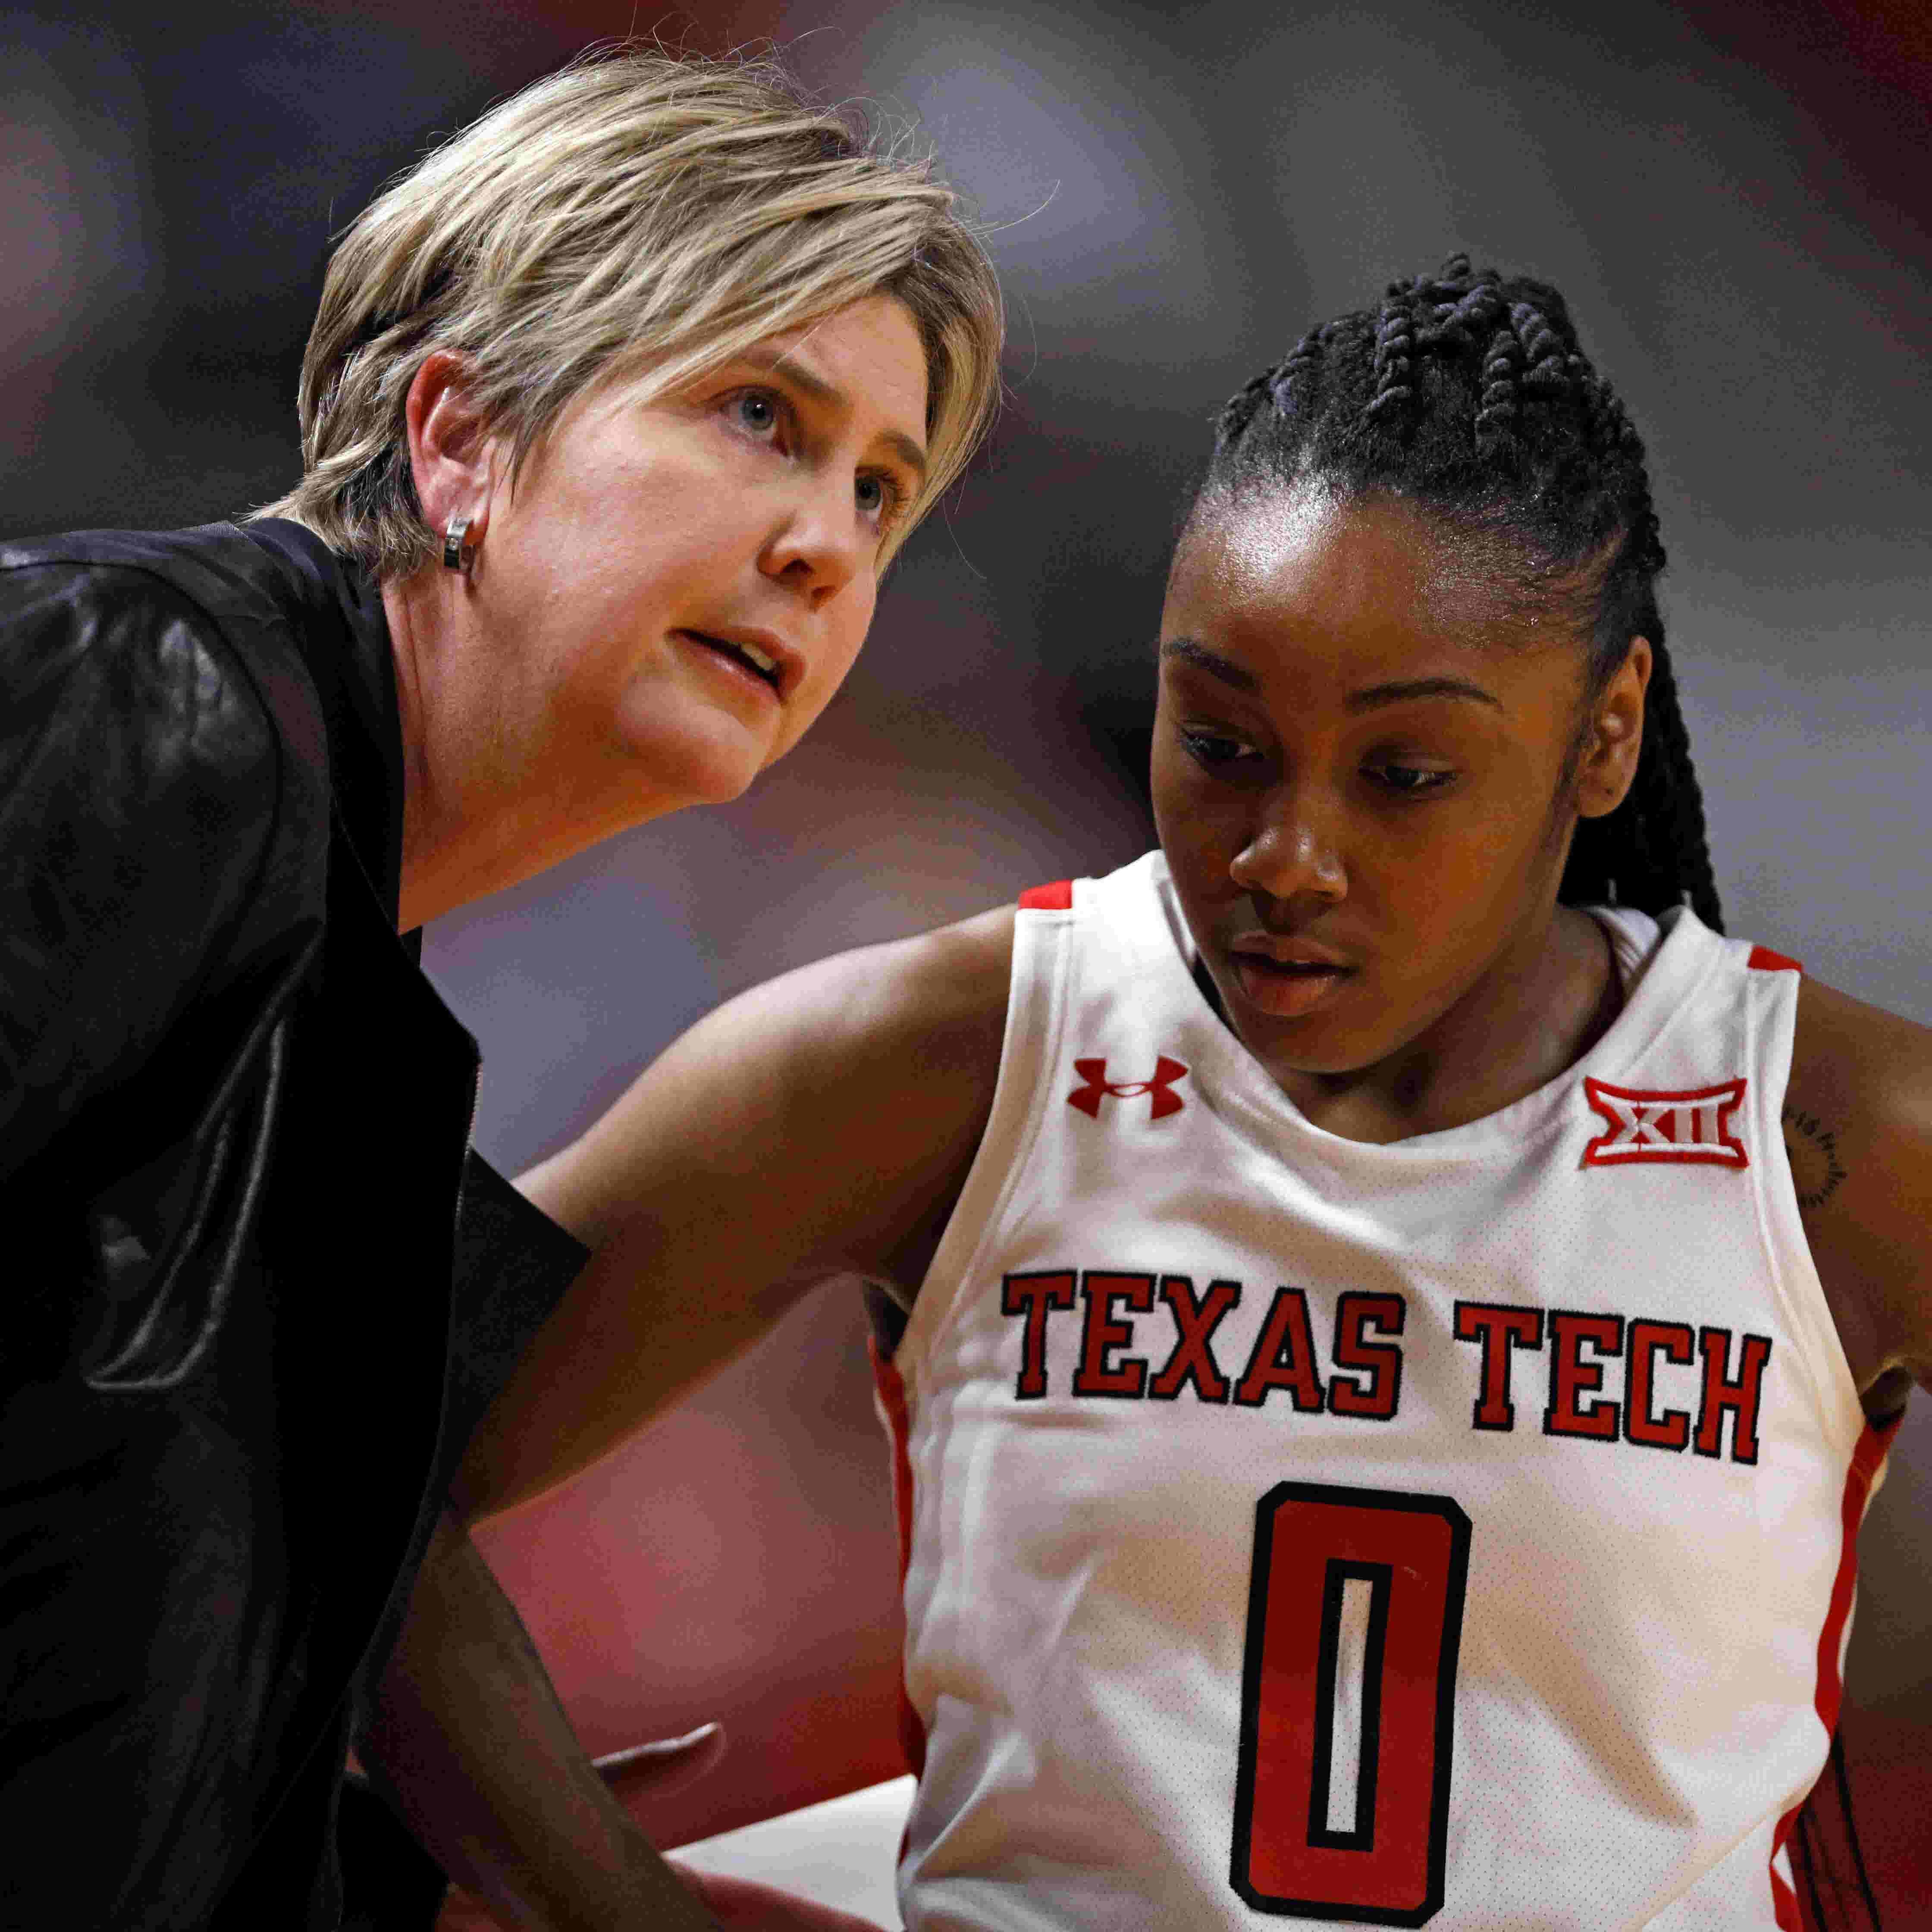 Texas Tech Hires Former Star Kirsta Gerlich As Coach